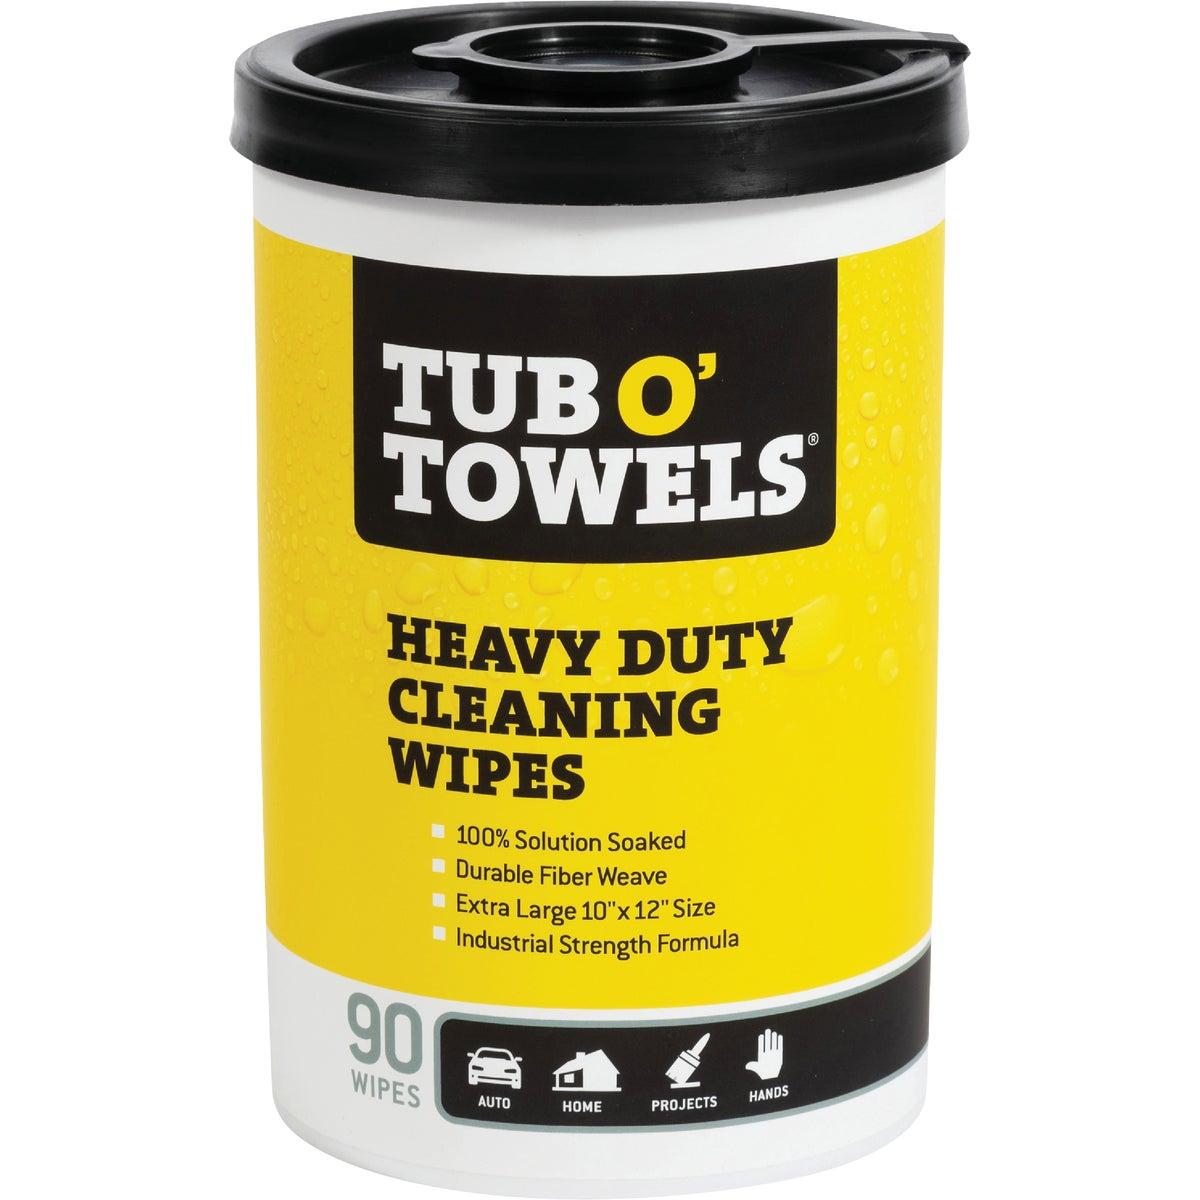 Tub O' Towels Cleaning Wipes